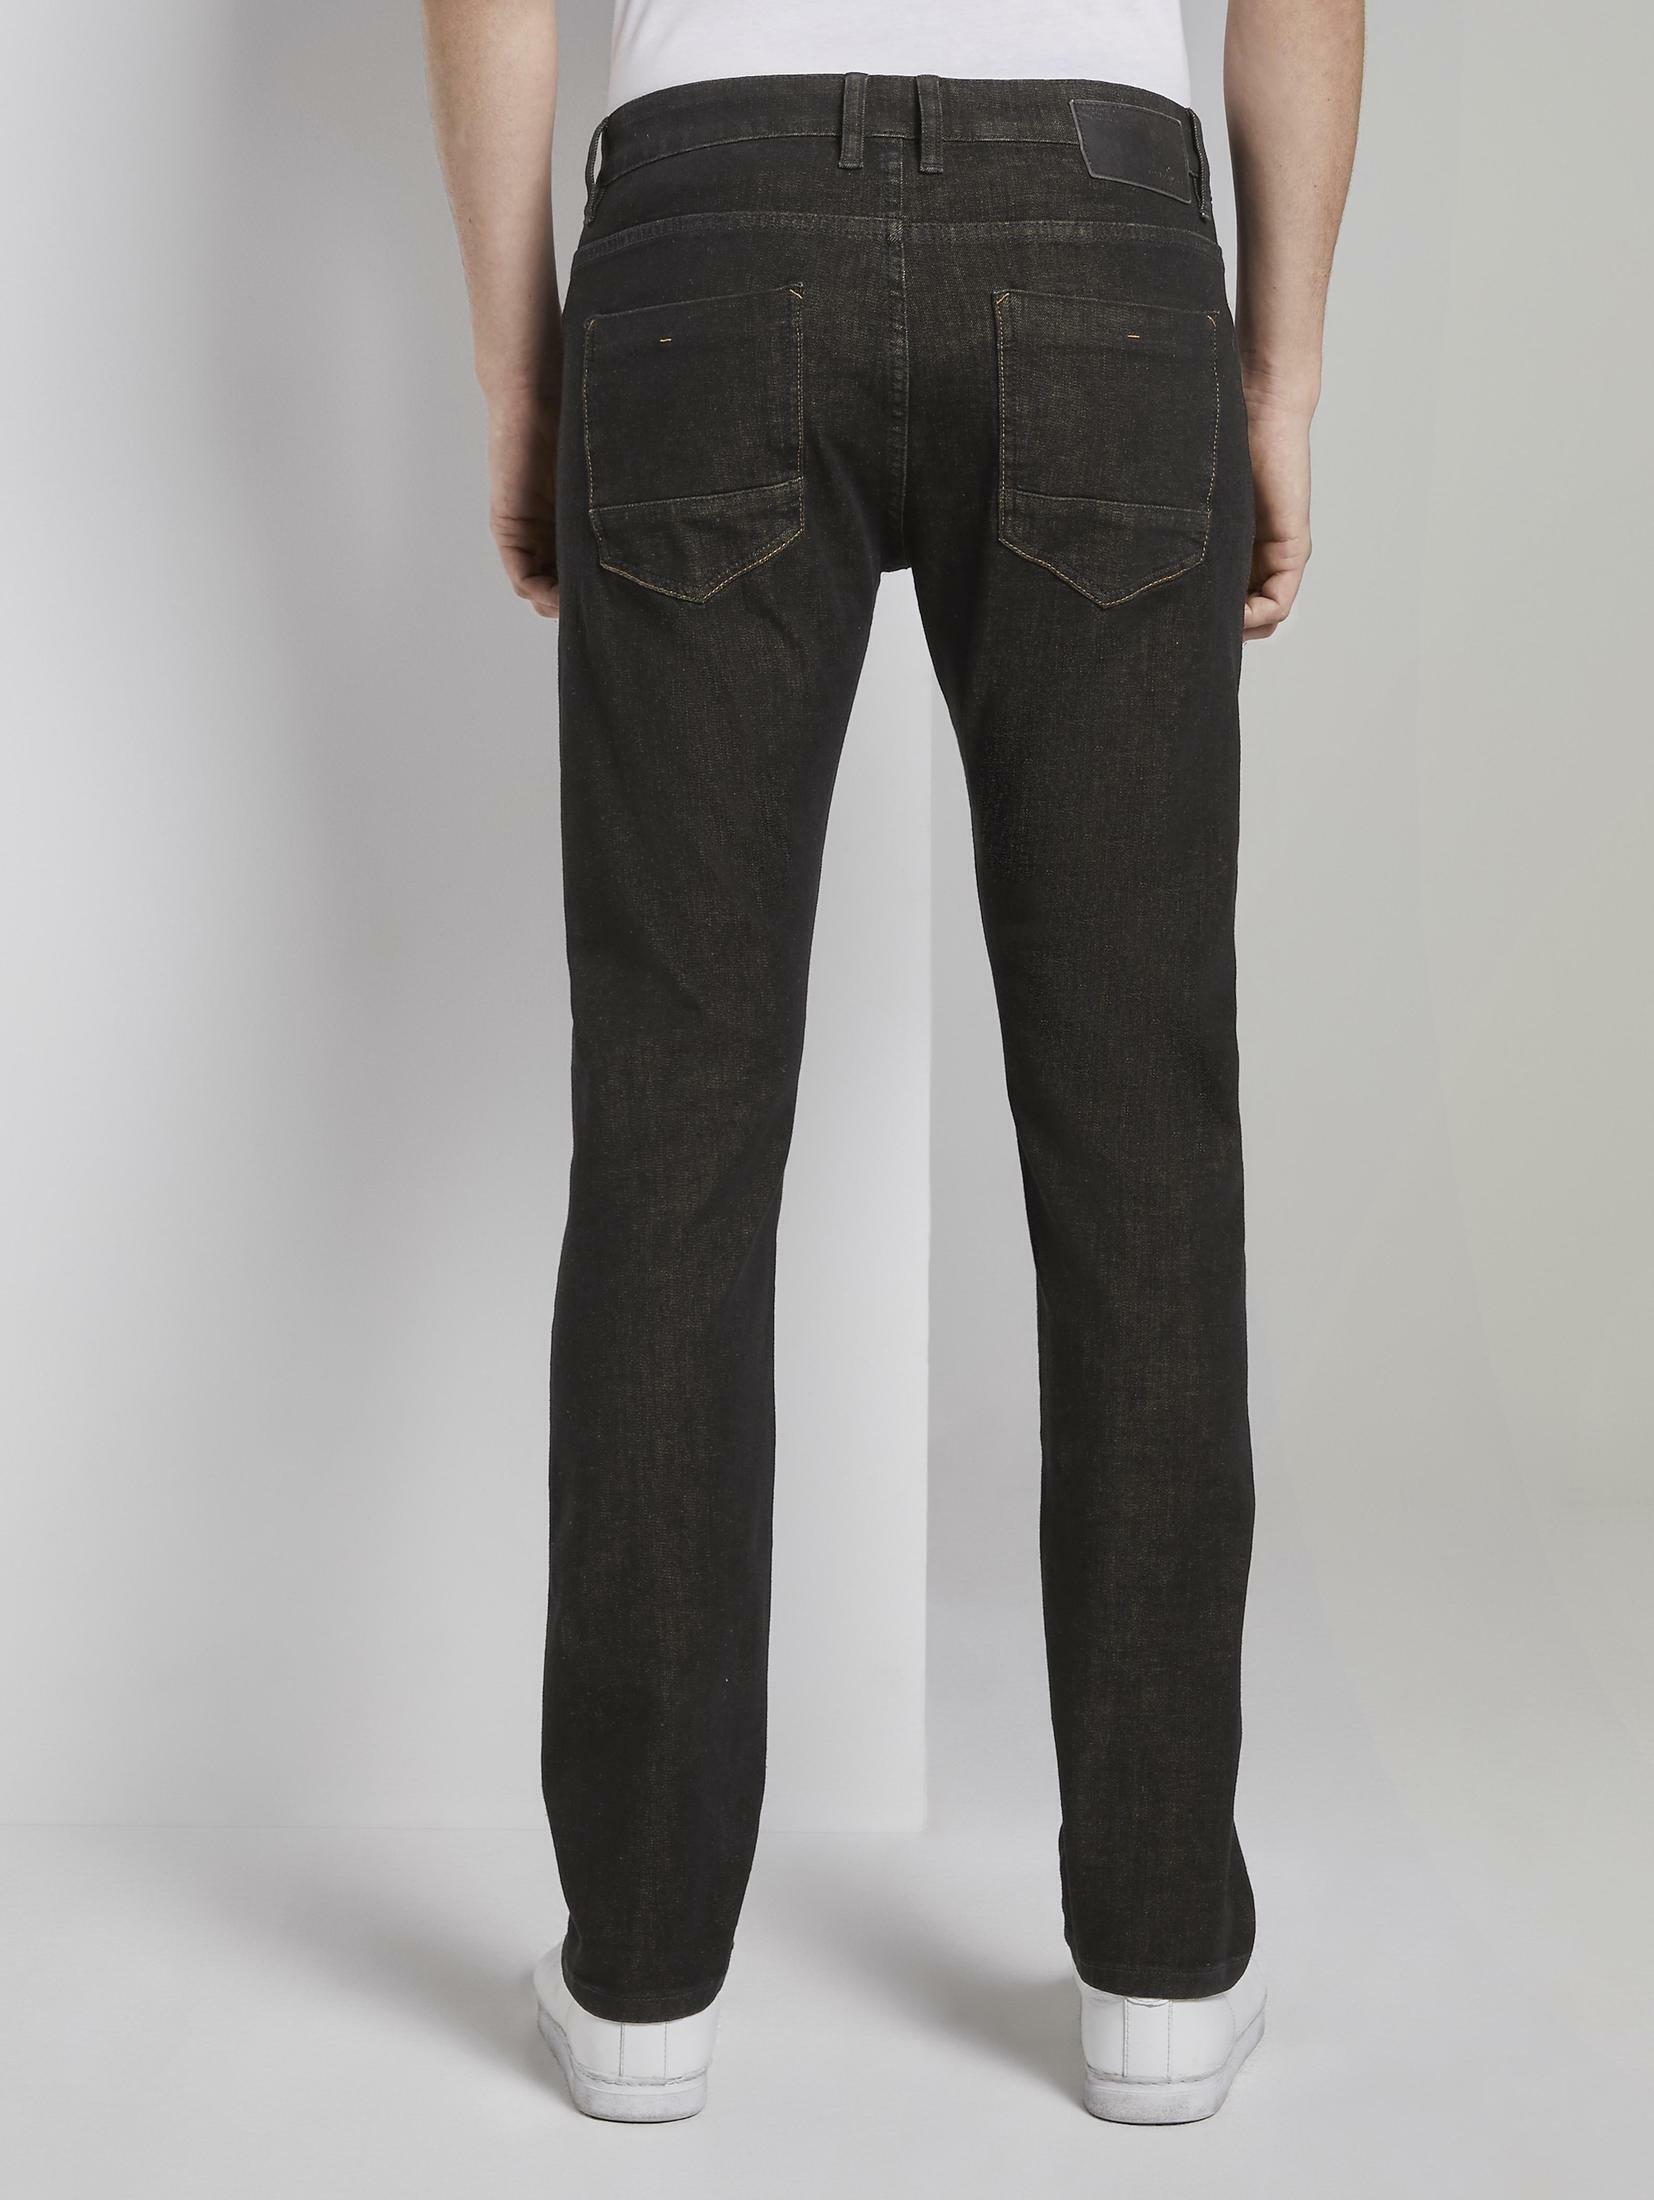 TOM TAILOR slim fit jeans »Troy Slim Tech Denim« veilig op otto.nl kopen